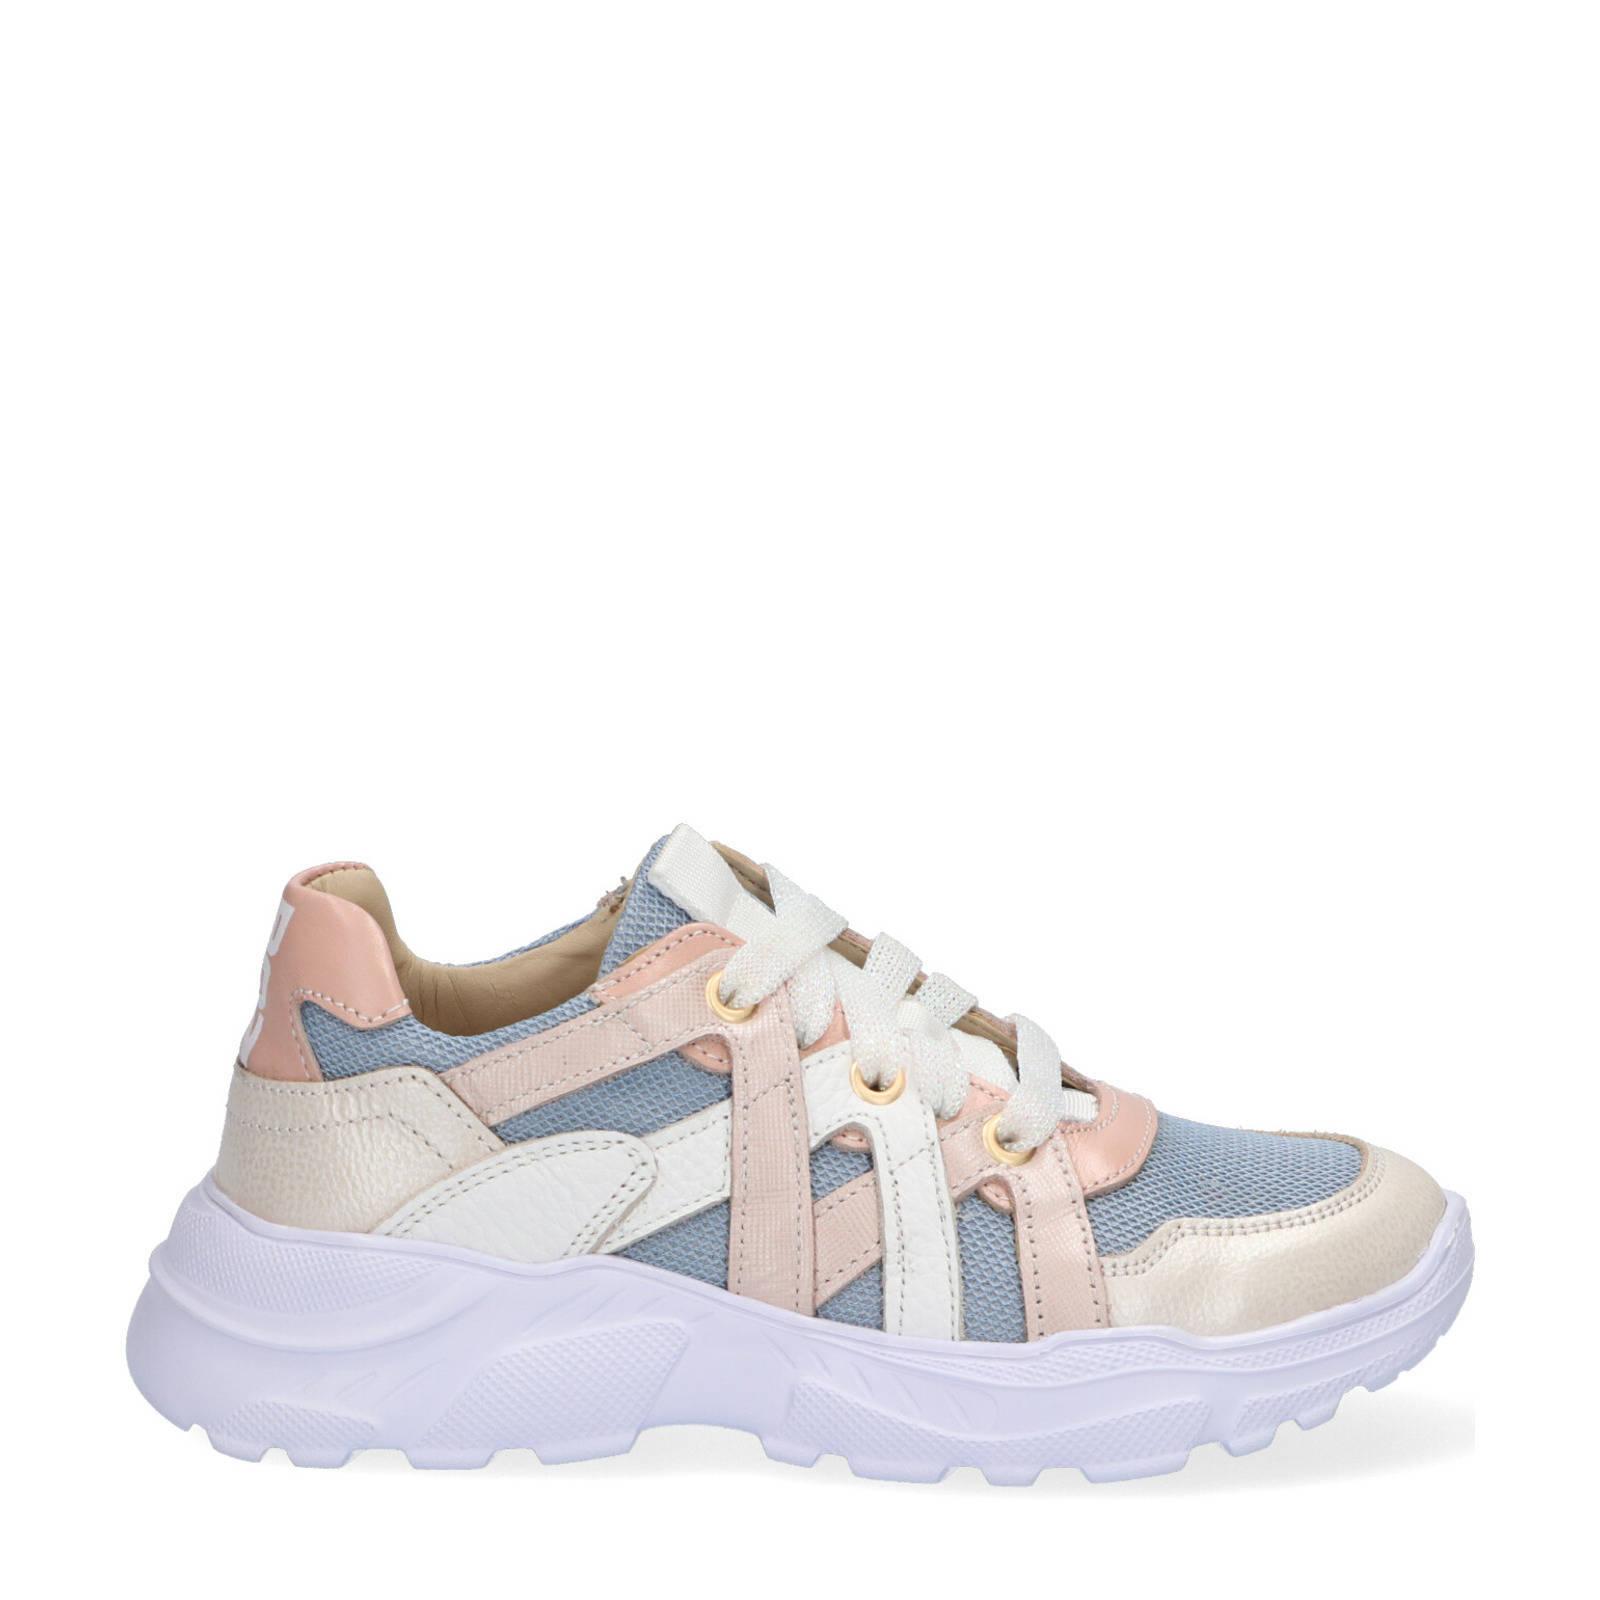 Braqeez Reny Run leren chunky sneakers blauw/multi online kopen